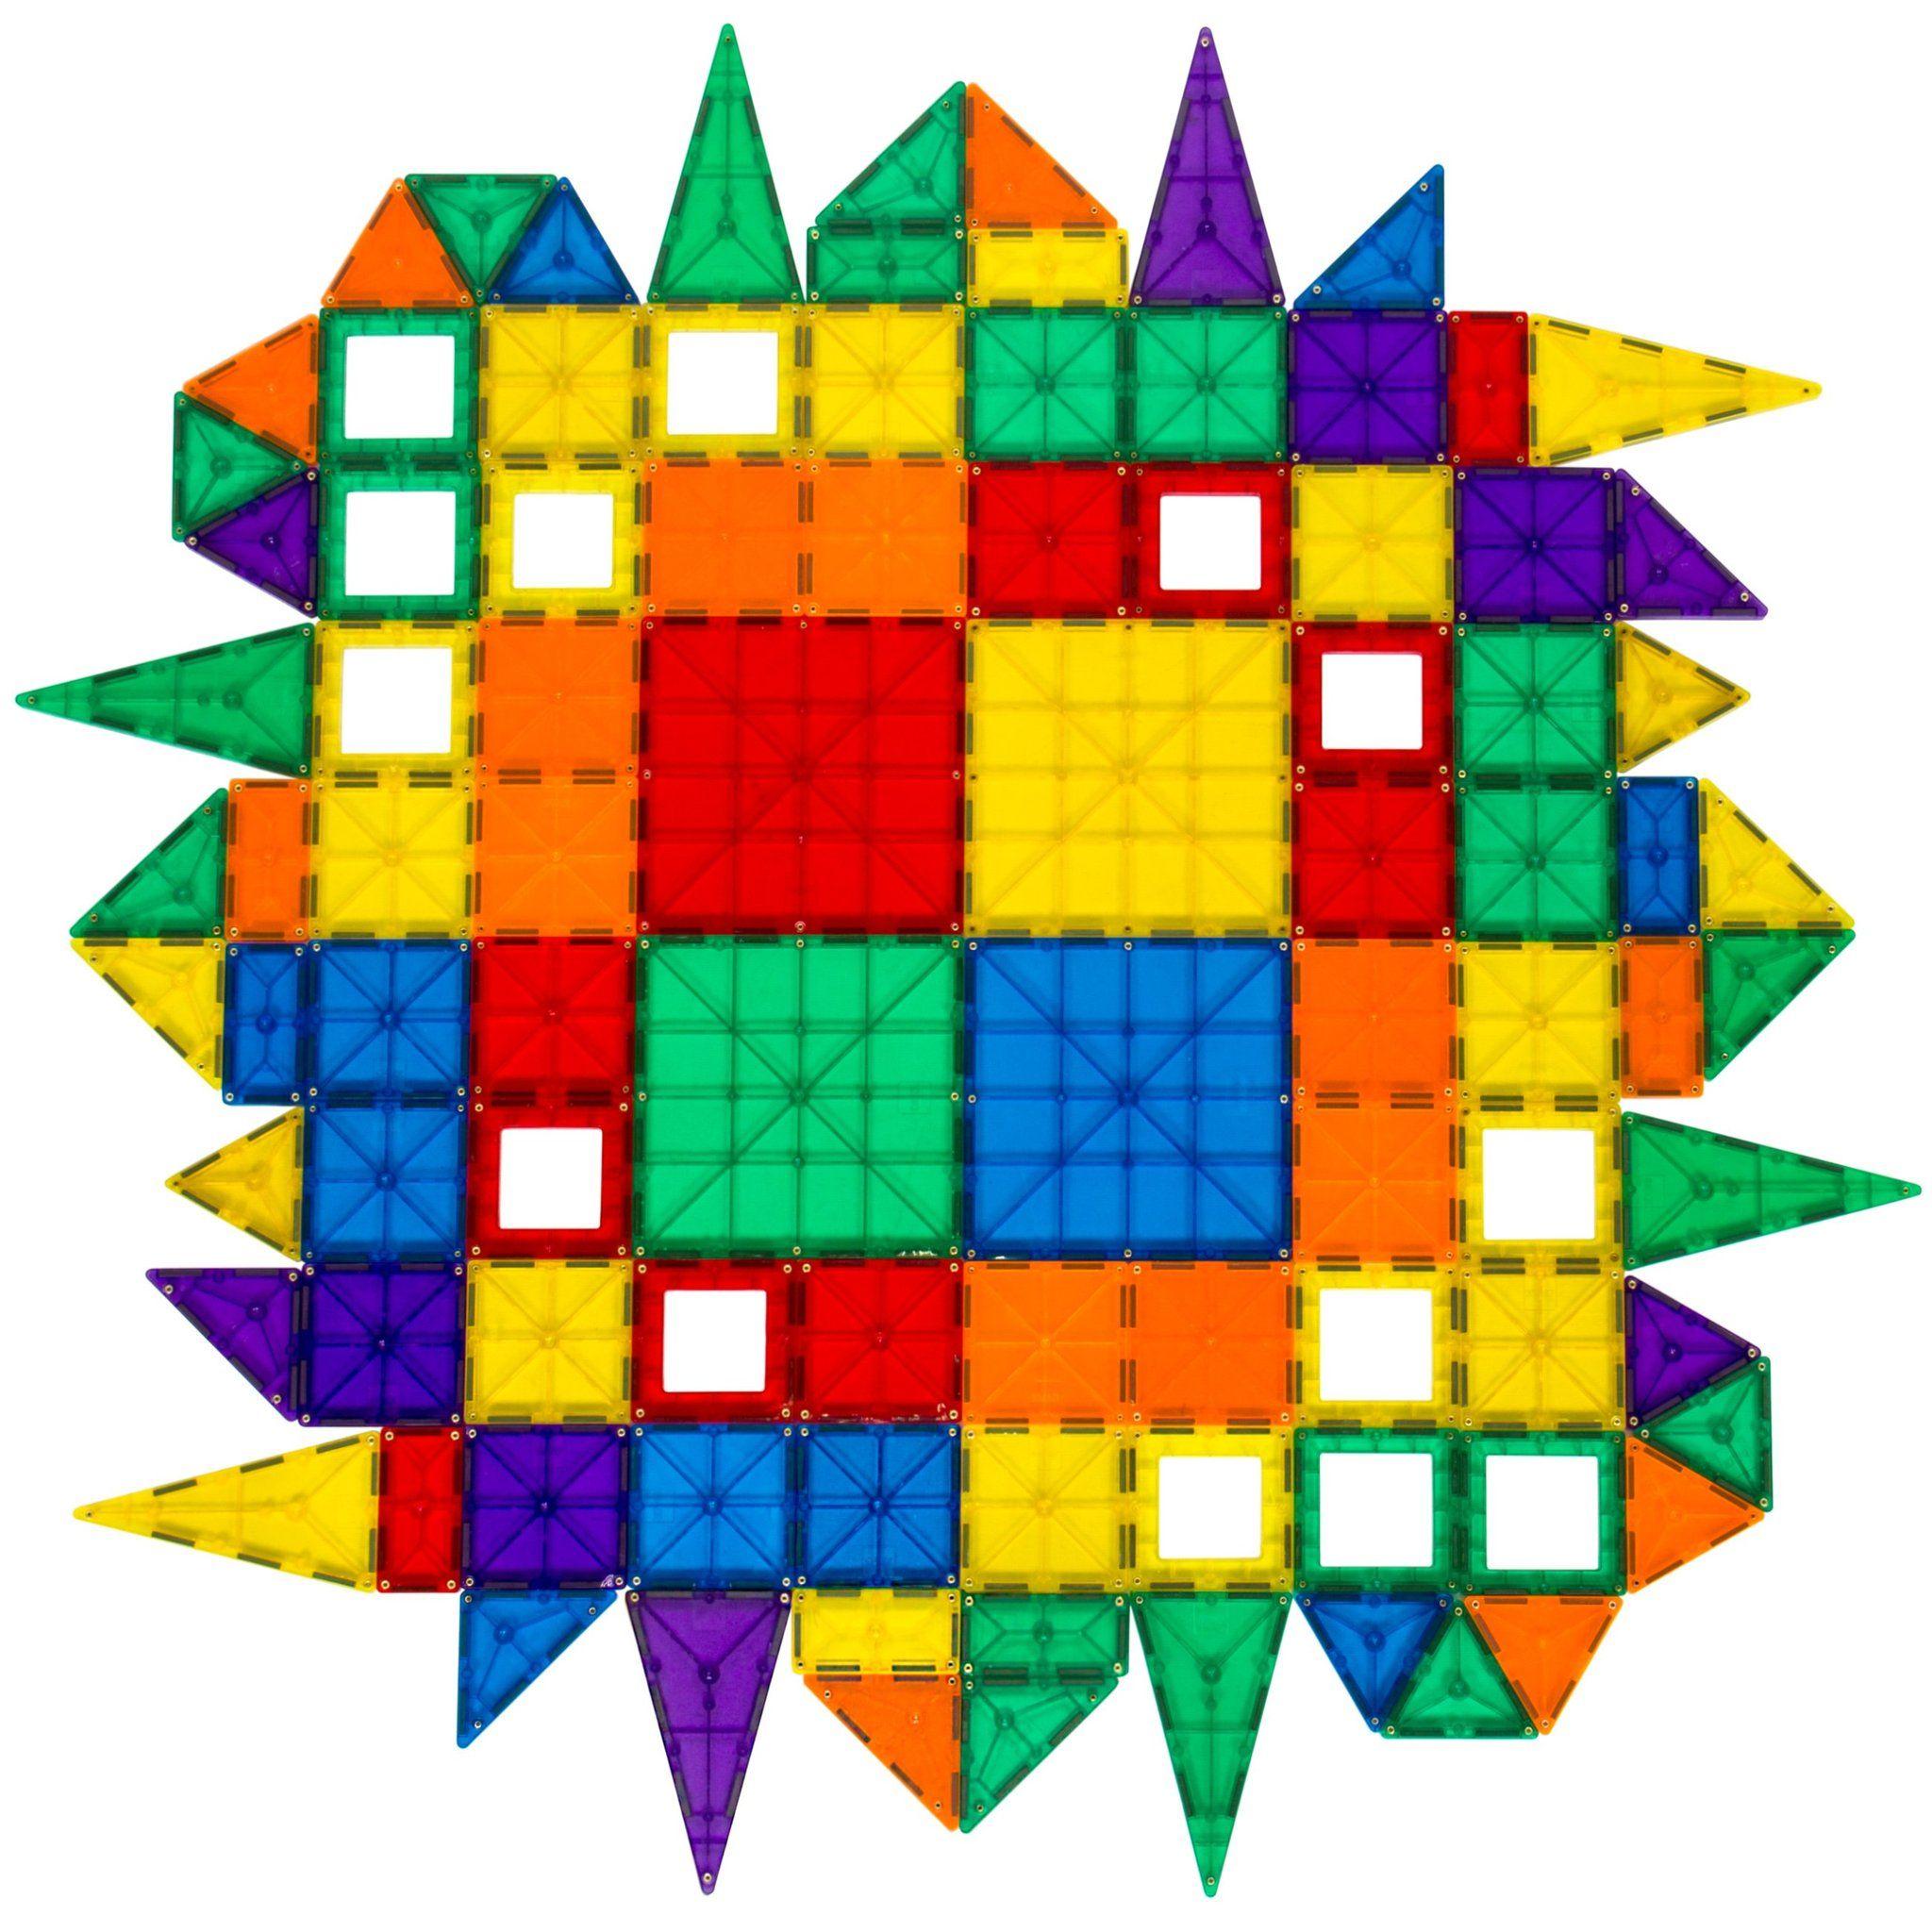 100 Piece Kids Clear Rainbow Magnetic Building Block Tiles Toy Set Multi Magnetic Tiles Geometric Tiles Magnetic Building Tiles